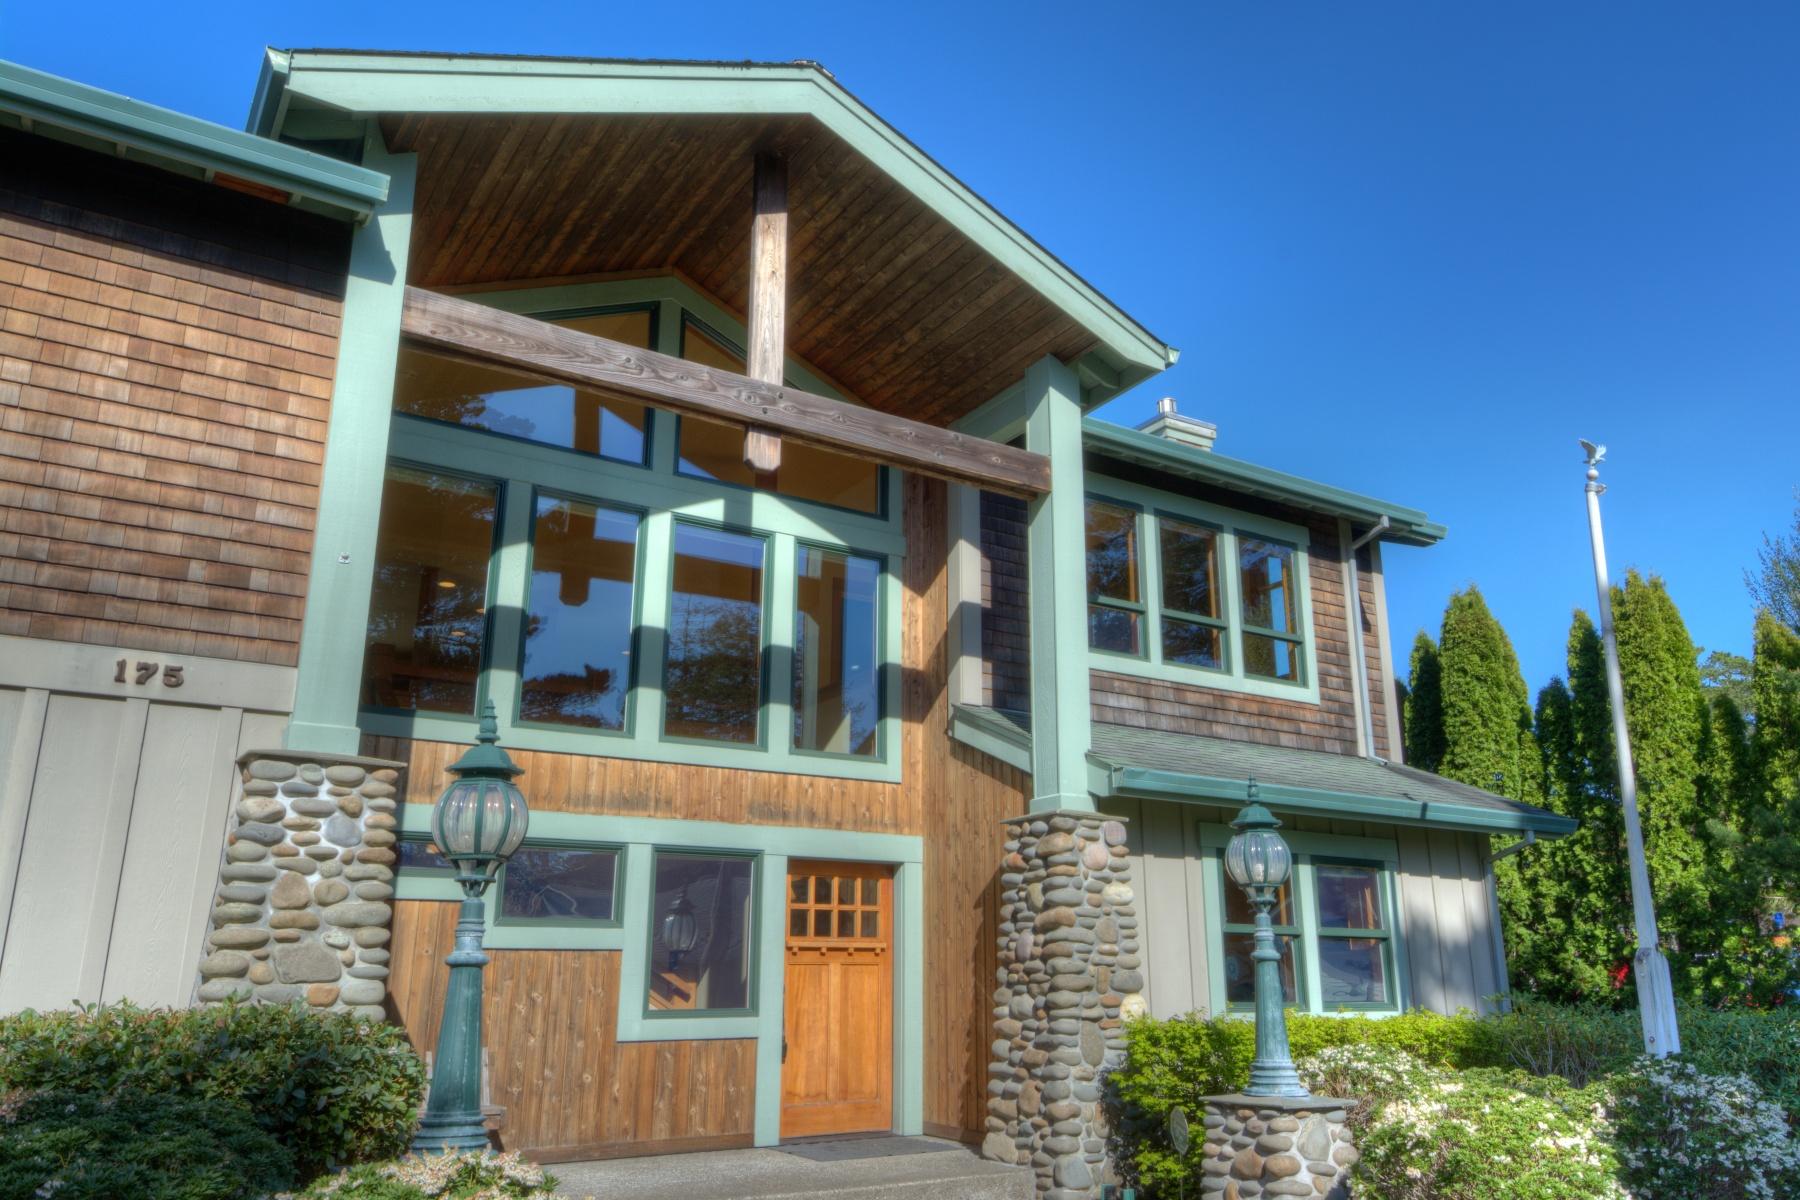 Single Family Home for Sale at 175 S FIFTH PL, MANZANITA, OR Manzanita, Oregon, 97130 United States